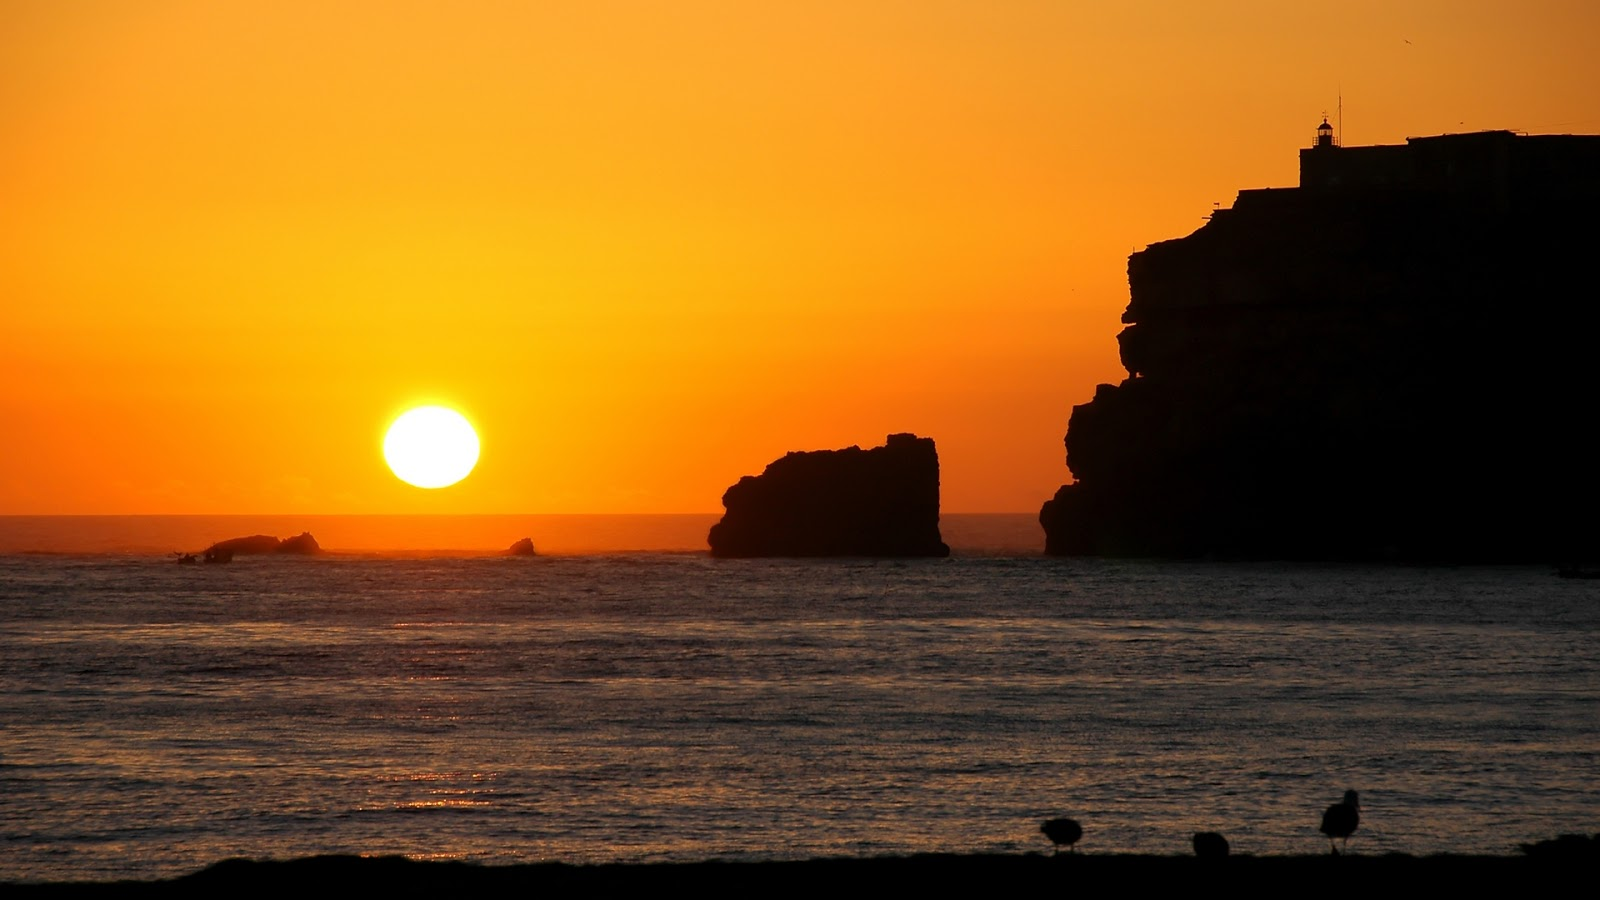 http://3.bp.blogspot.com/-rkYFwpC41JE/UWFZ-6D4DMI/AAAAAAAAFHk/0afl491ldNk/s1600/hd-wallpaper-with-sunset-at-rocks-and-sea.jpg